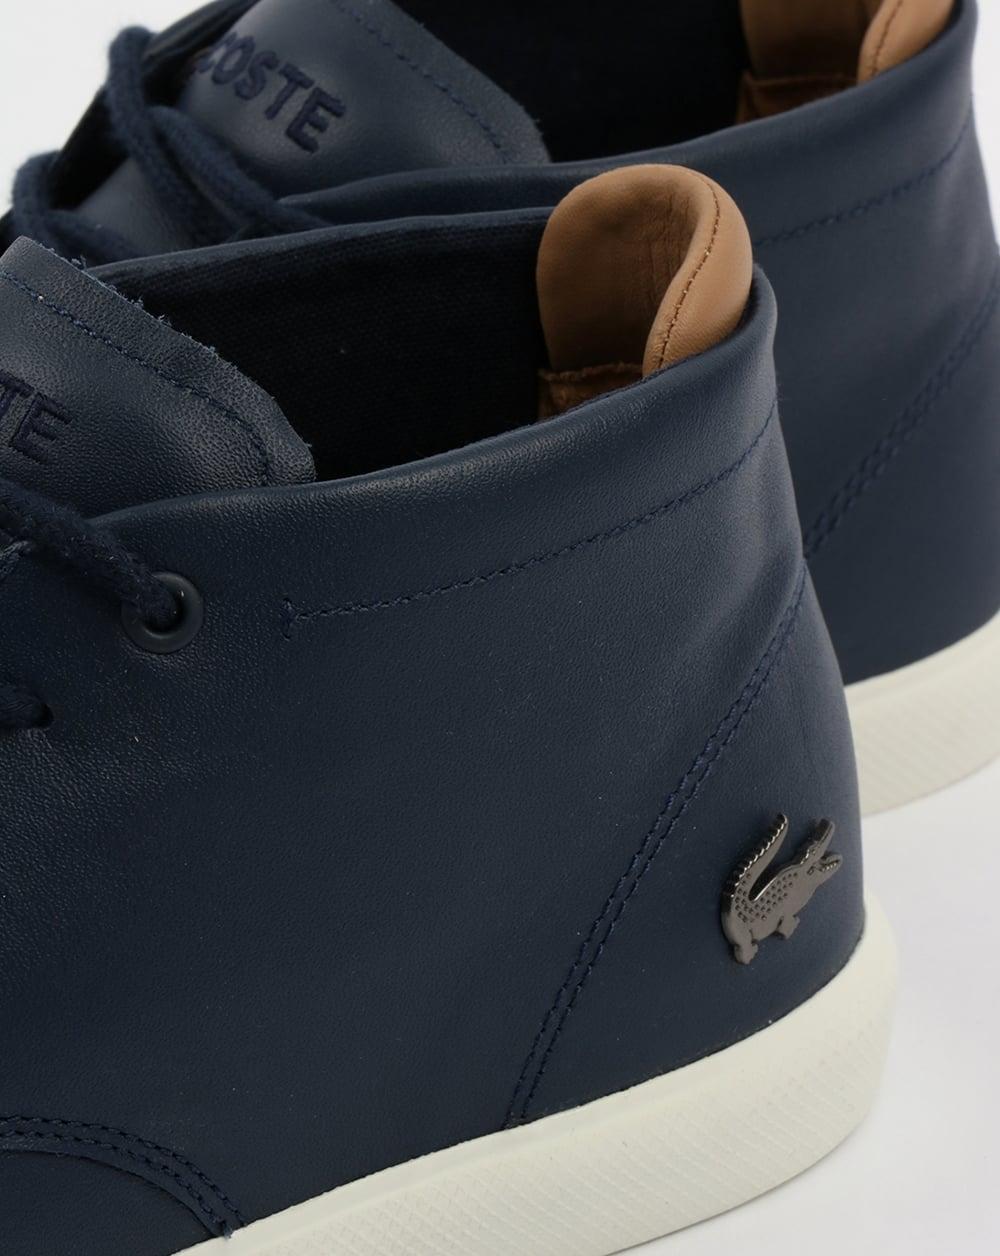 5b0175c4c3a Lacoste Footwear Espere Chukka Boots Navy